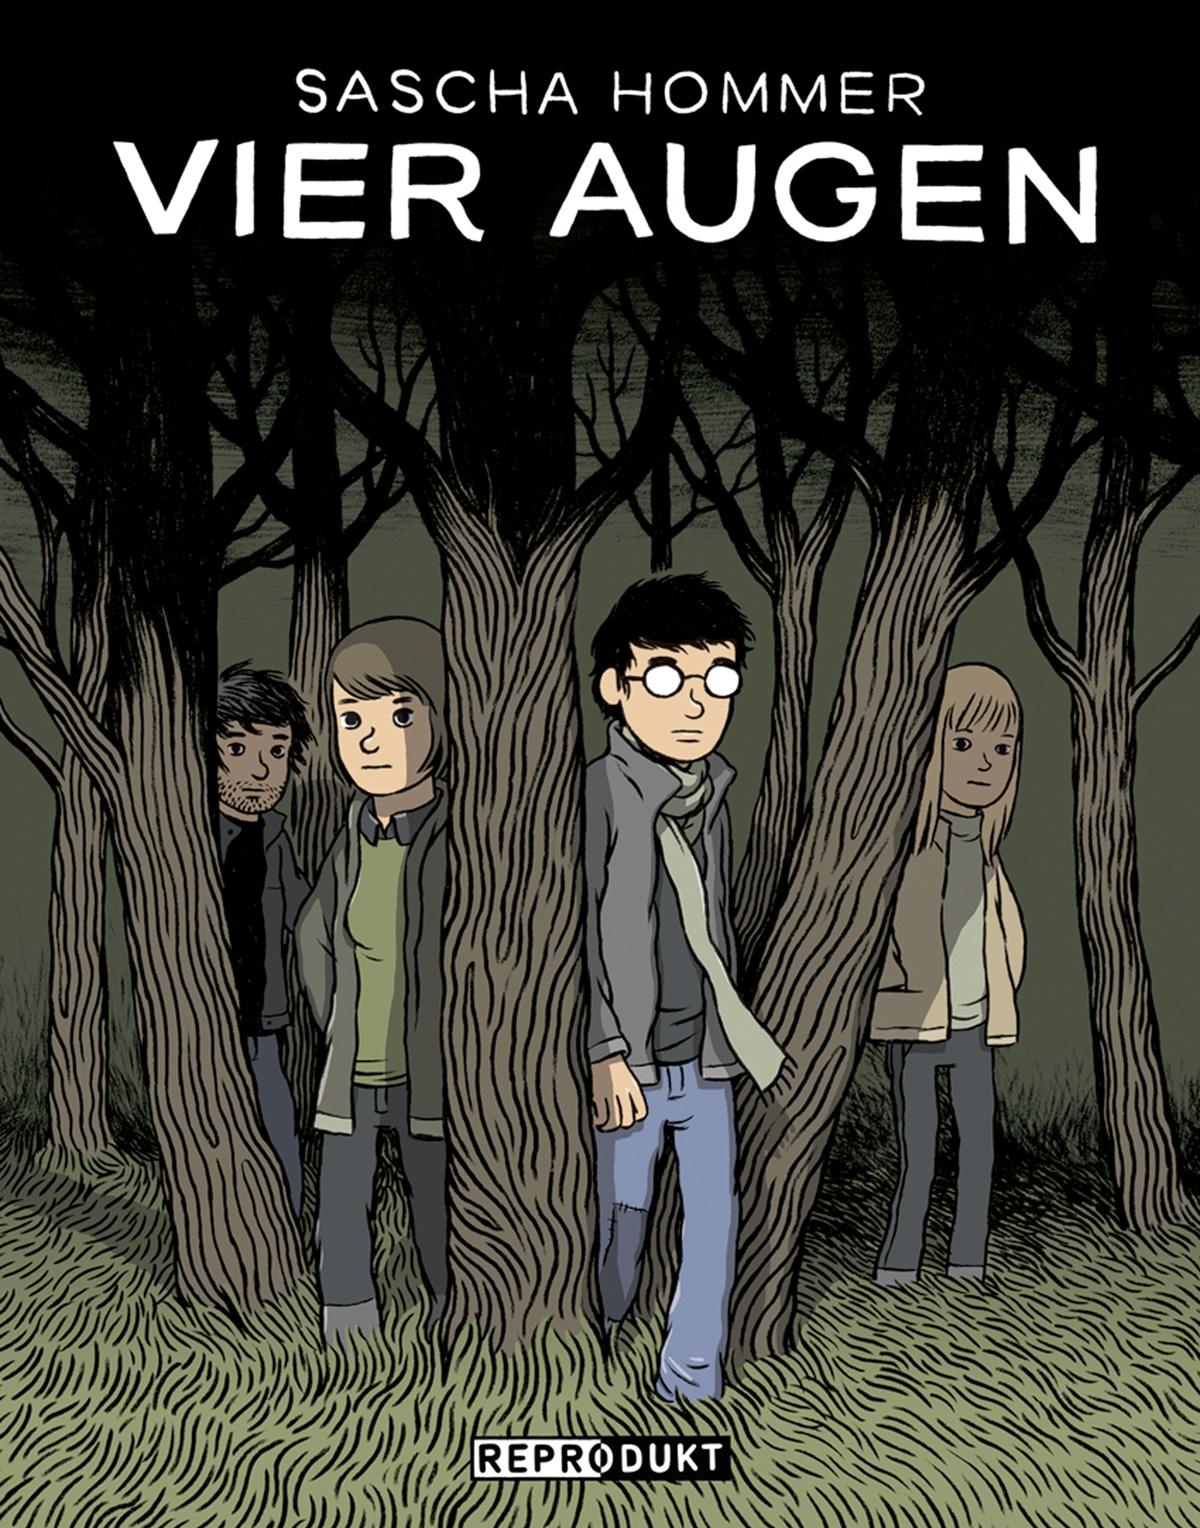 va_cover_front